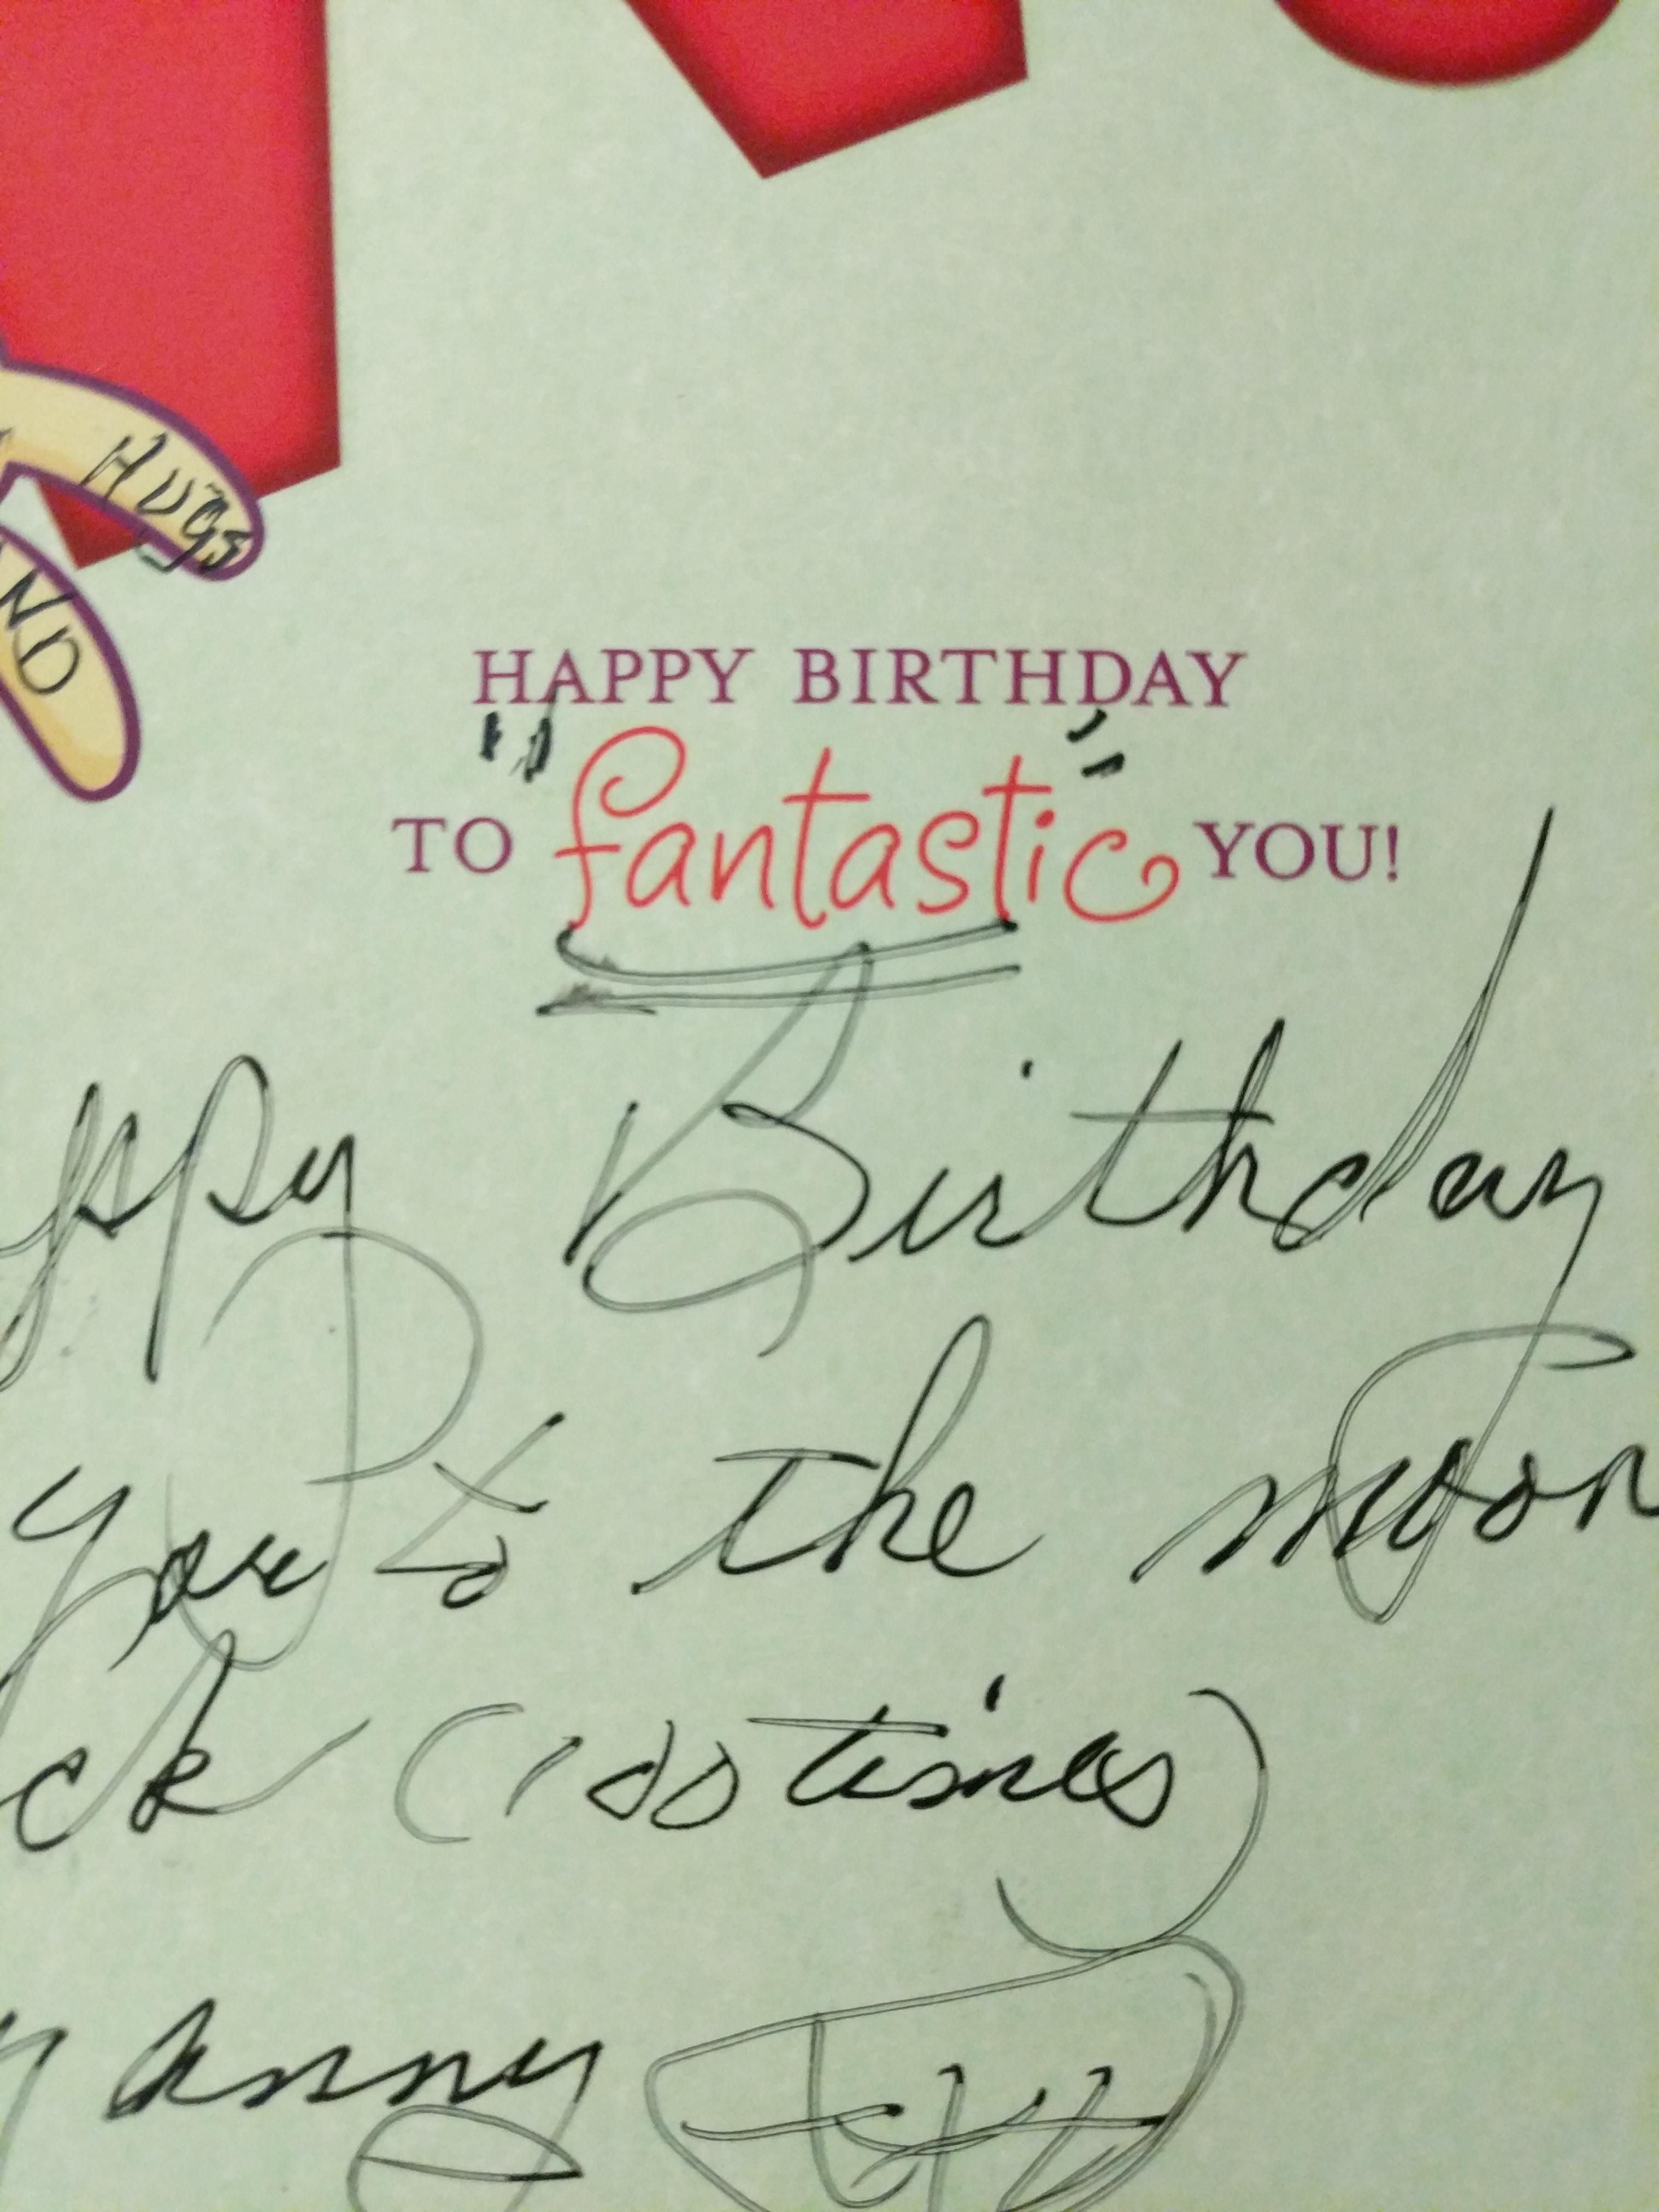 Am I fantastic or not grandma? Happy birthday, Quotes, Happy